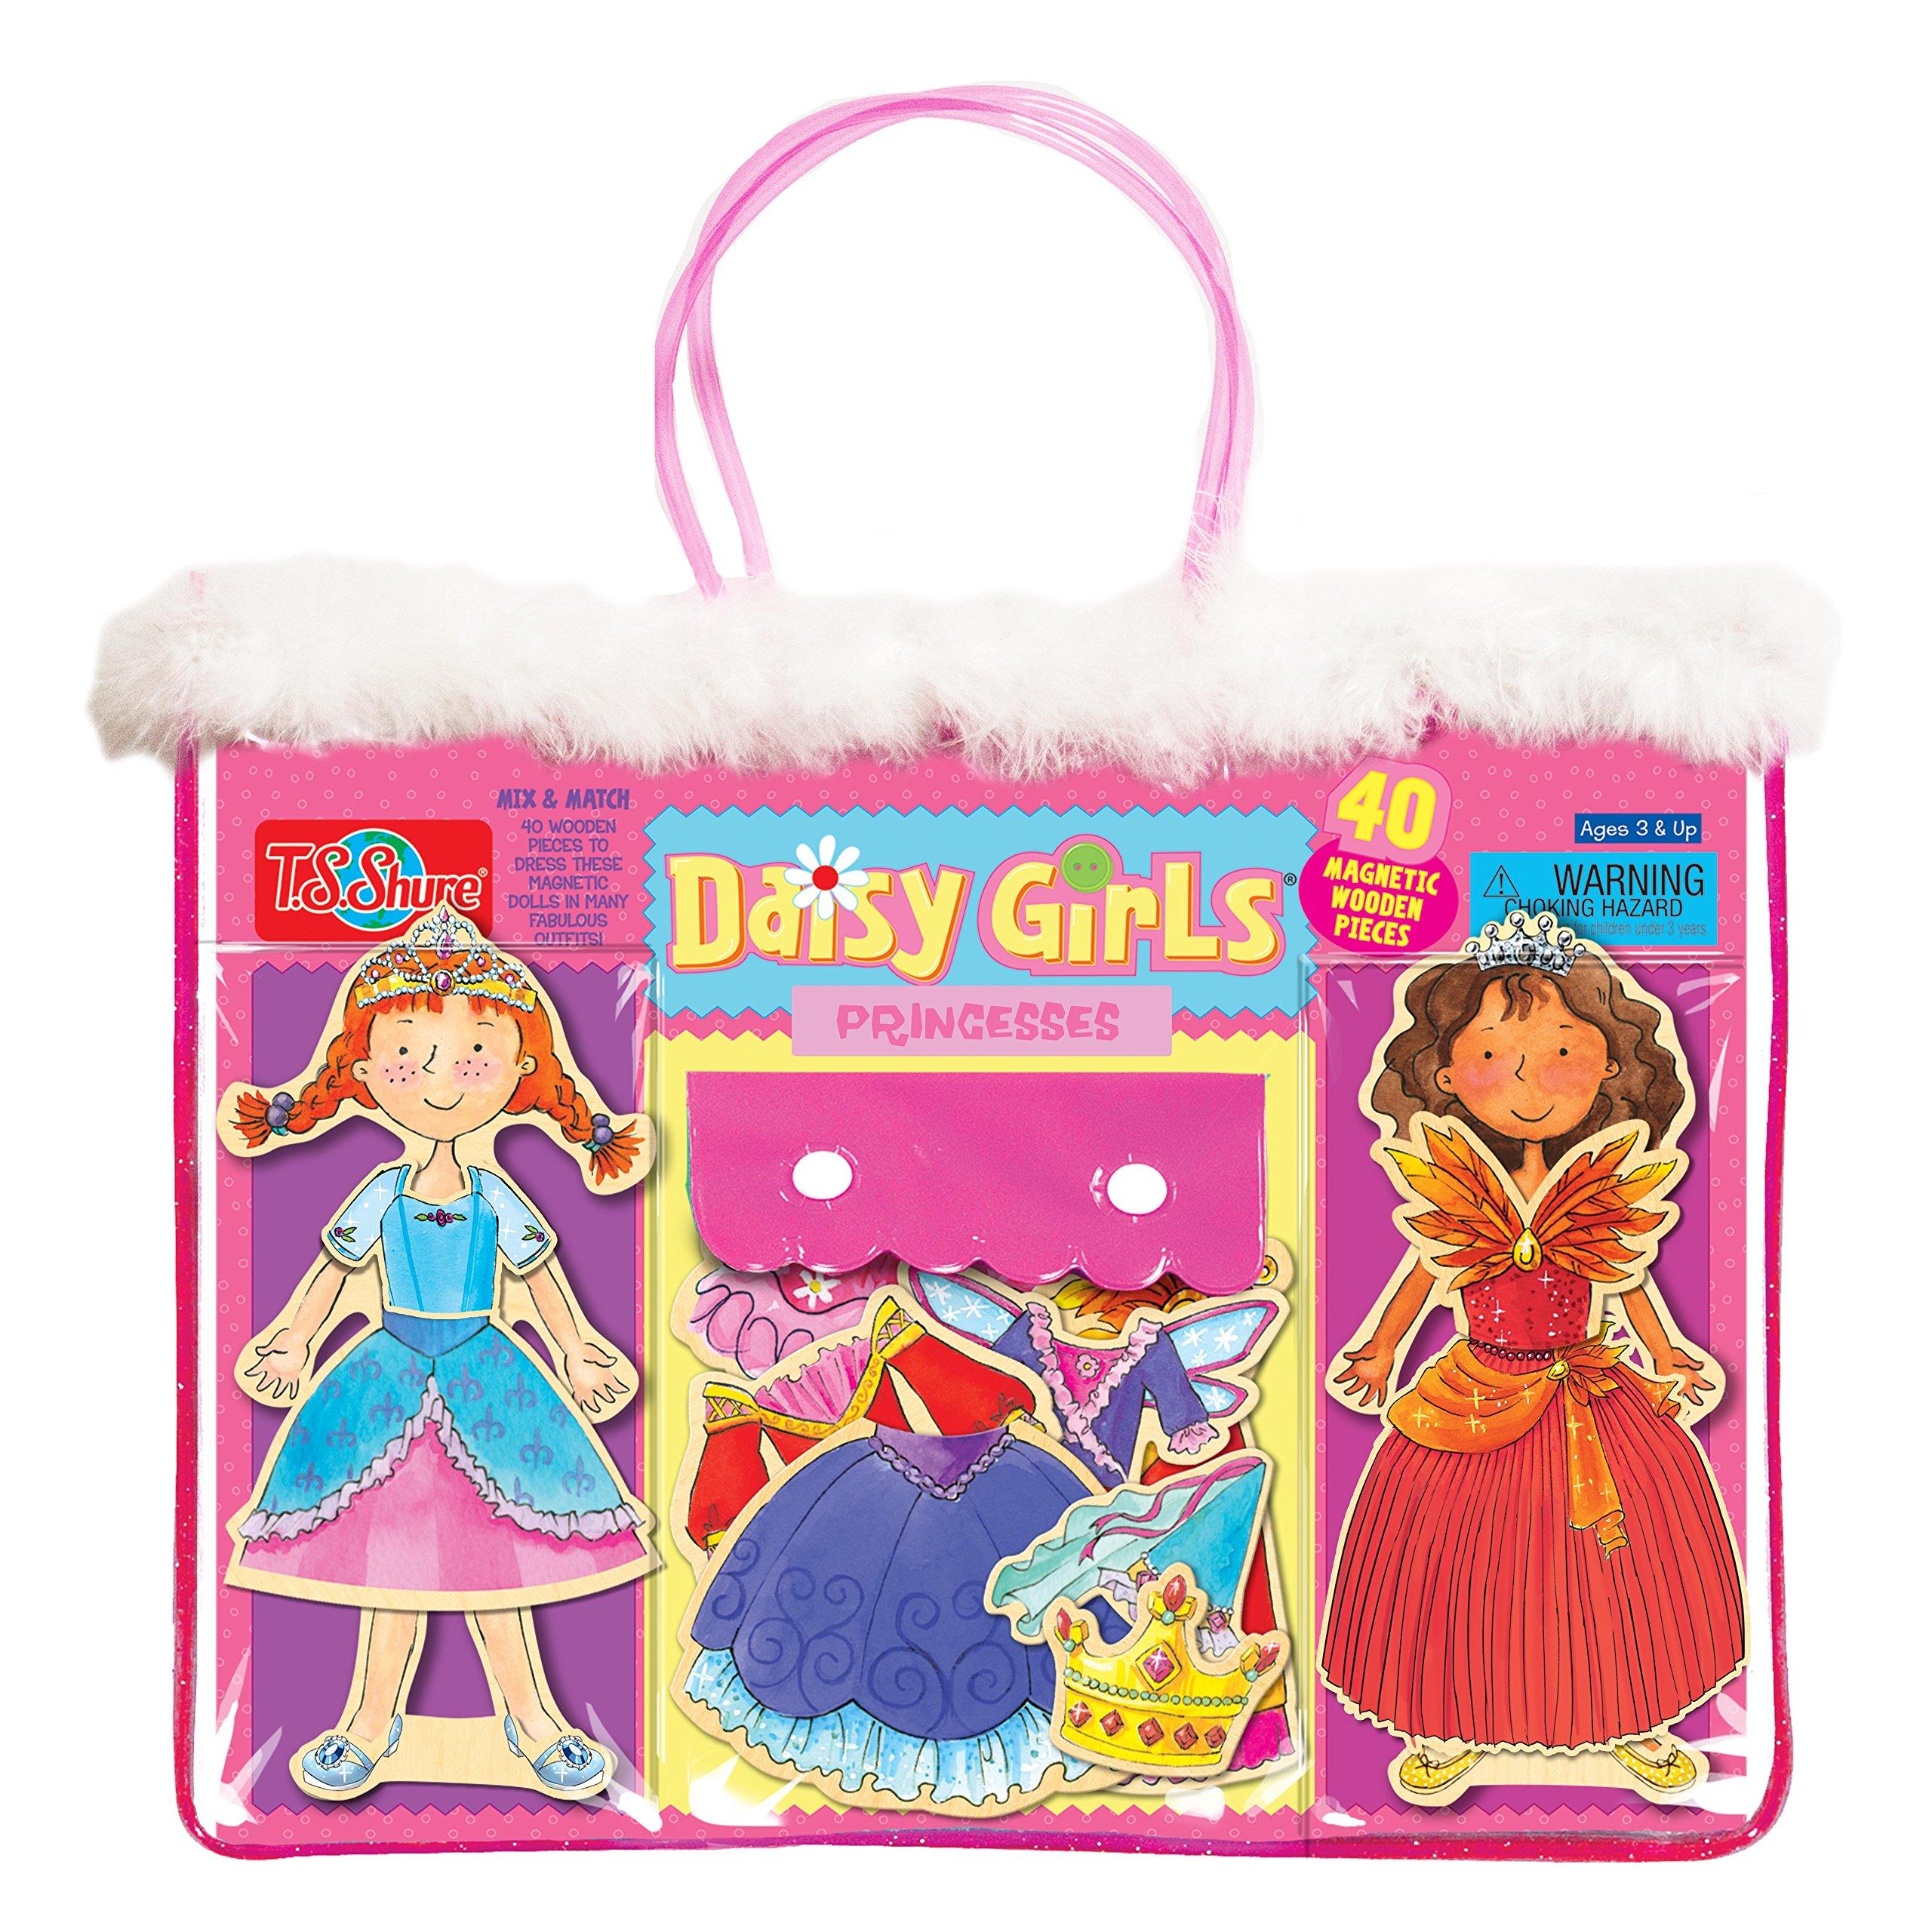 T.S. Shure Daisy Girls Princesses Wooden Magnetic Dress-Up Dolls Wooden Magnetic Dolls by T.S. Shure